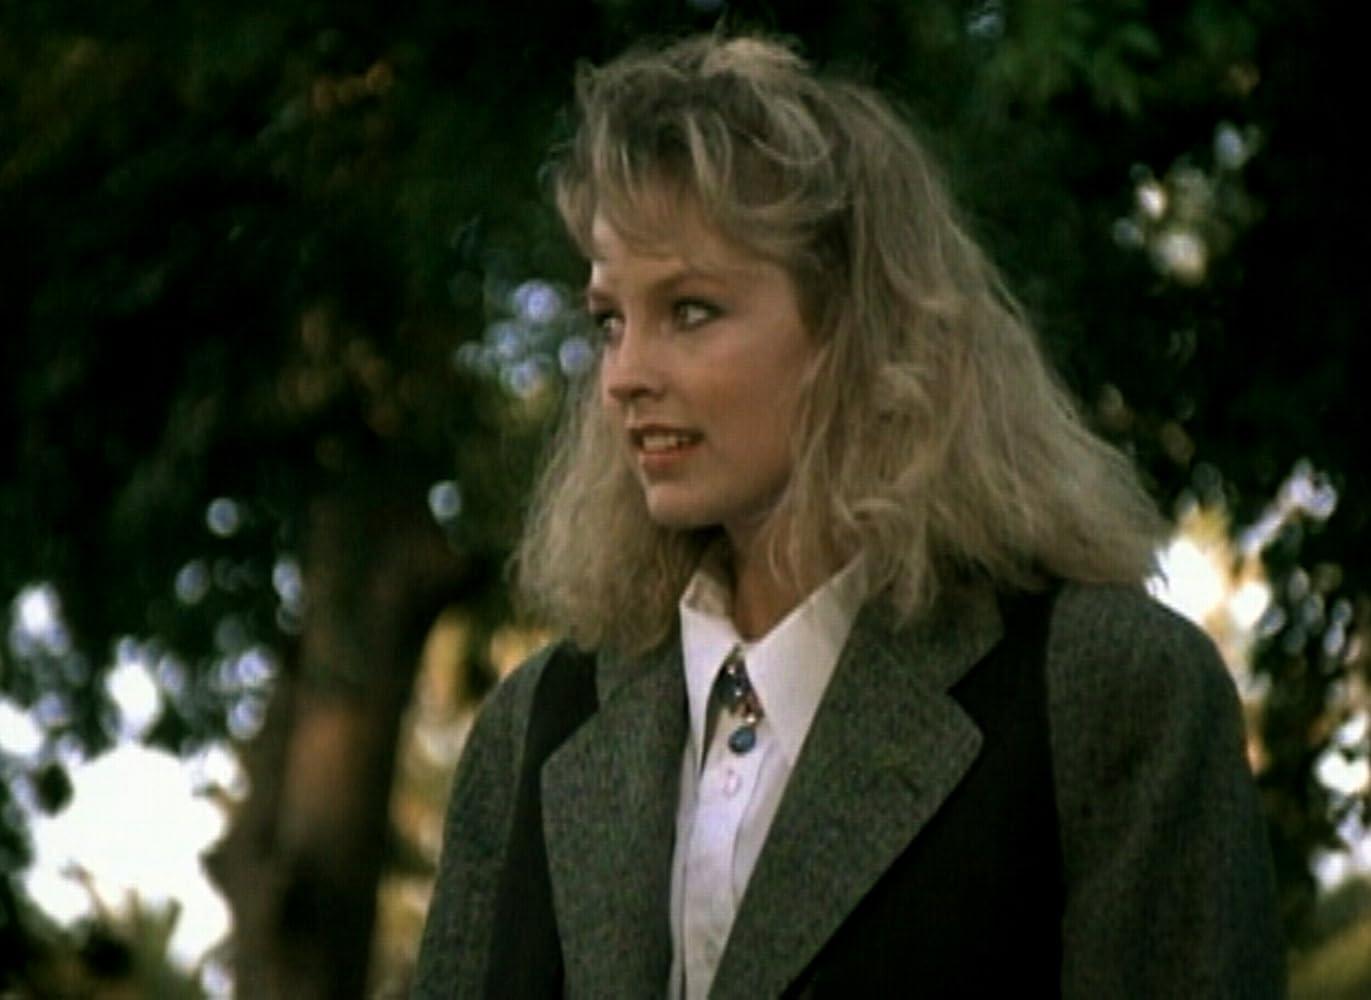 Sharlene San Pedro (b. 1999),Marianne Stone Hot movies Sanna-June Hyde,Aloma Steele